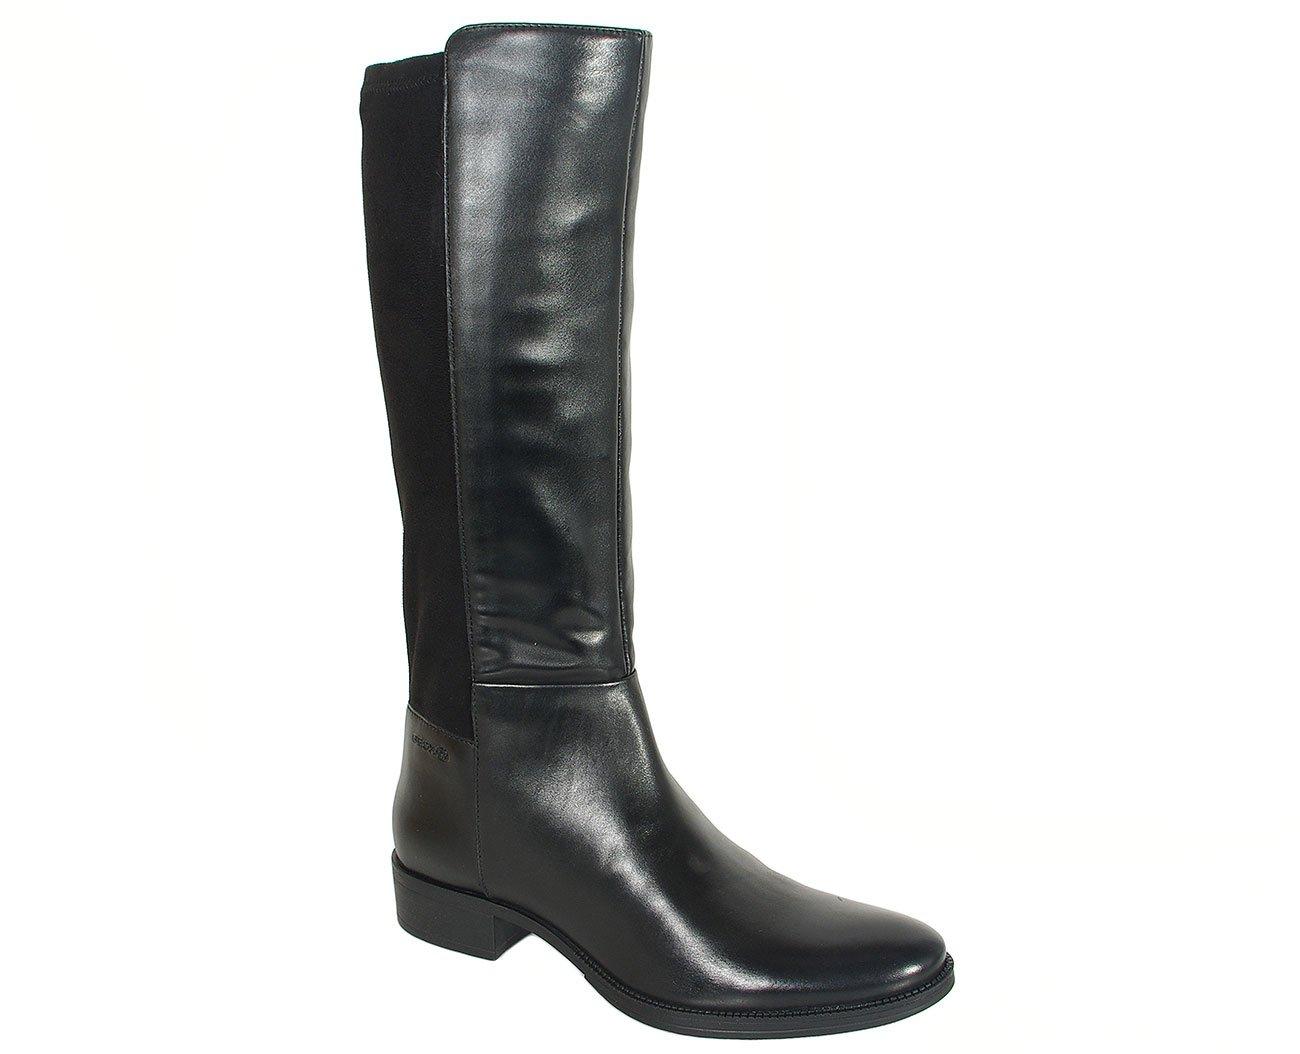 GEOX Laceyin D kozaki GBK+smooth leather black